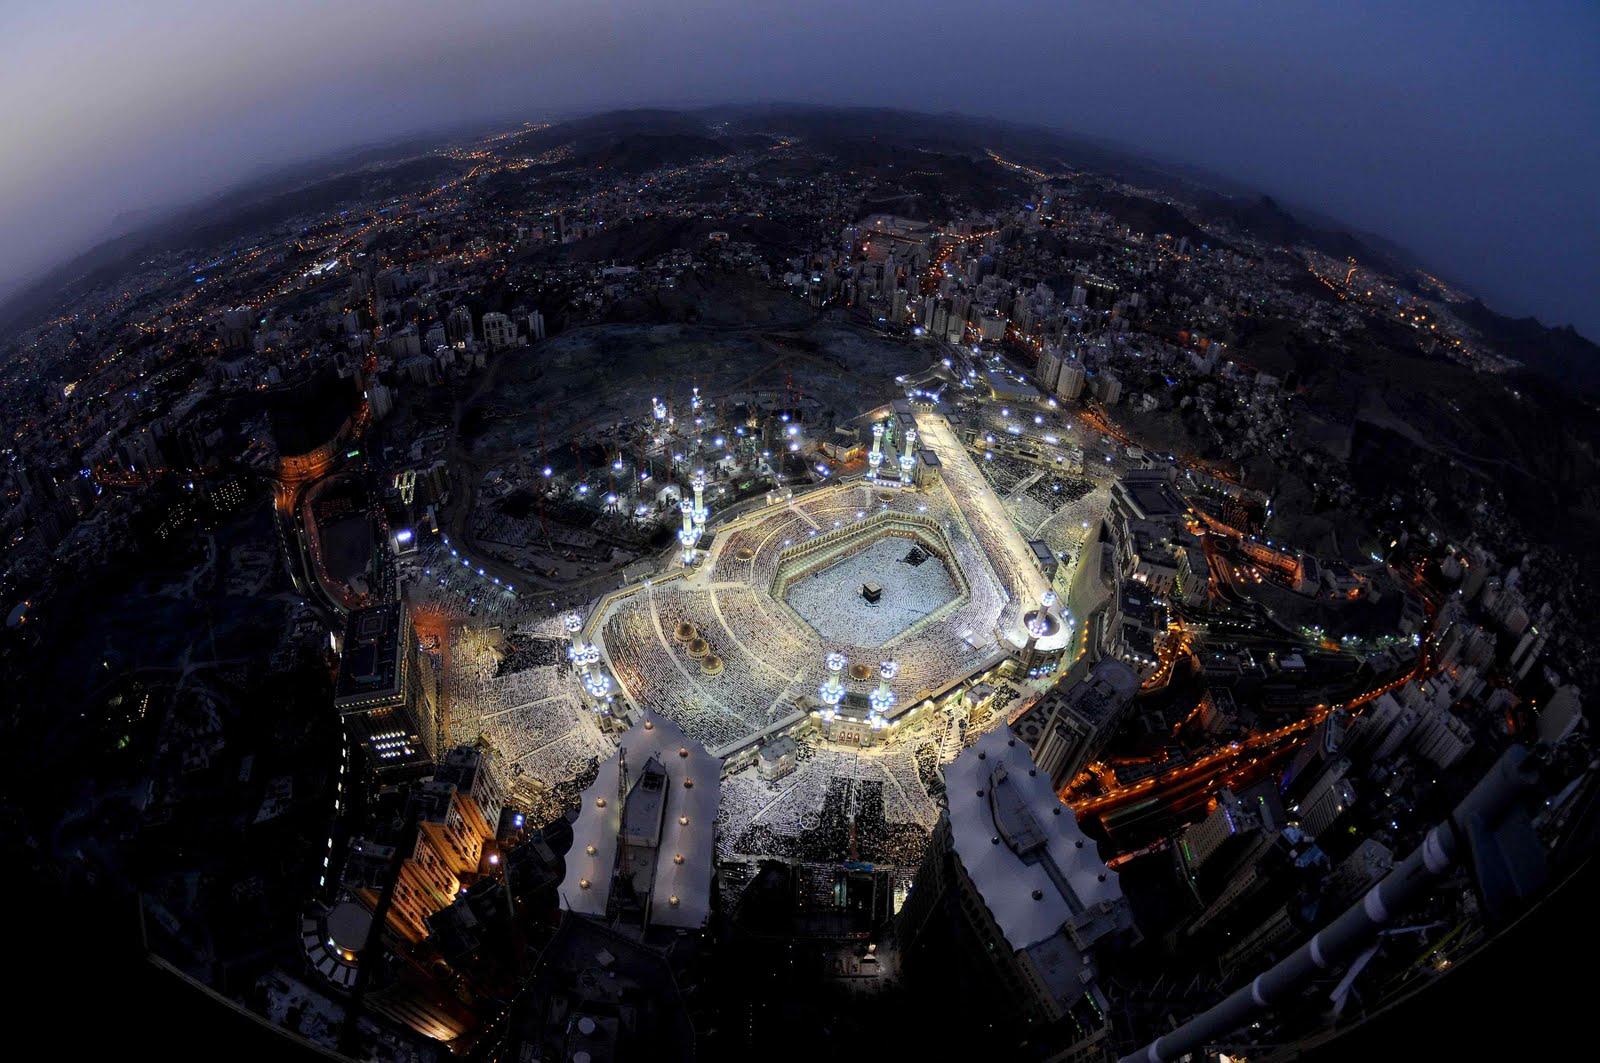 mecca-kaaba-satellite-photo-high-resolution-288786